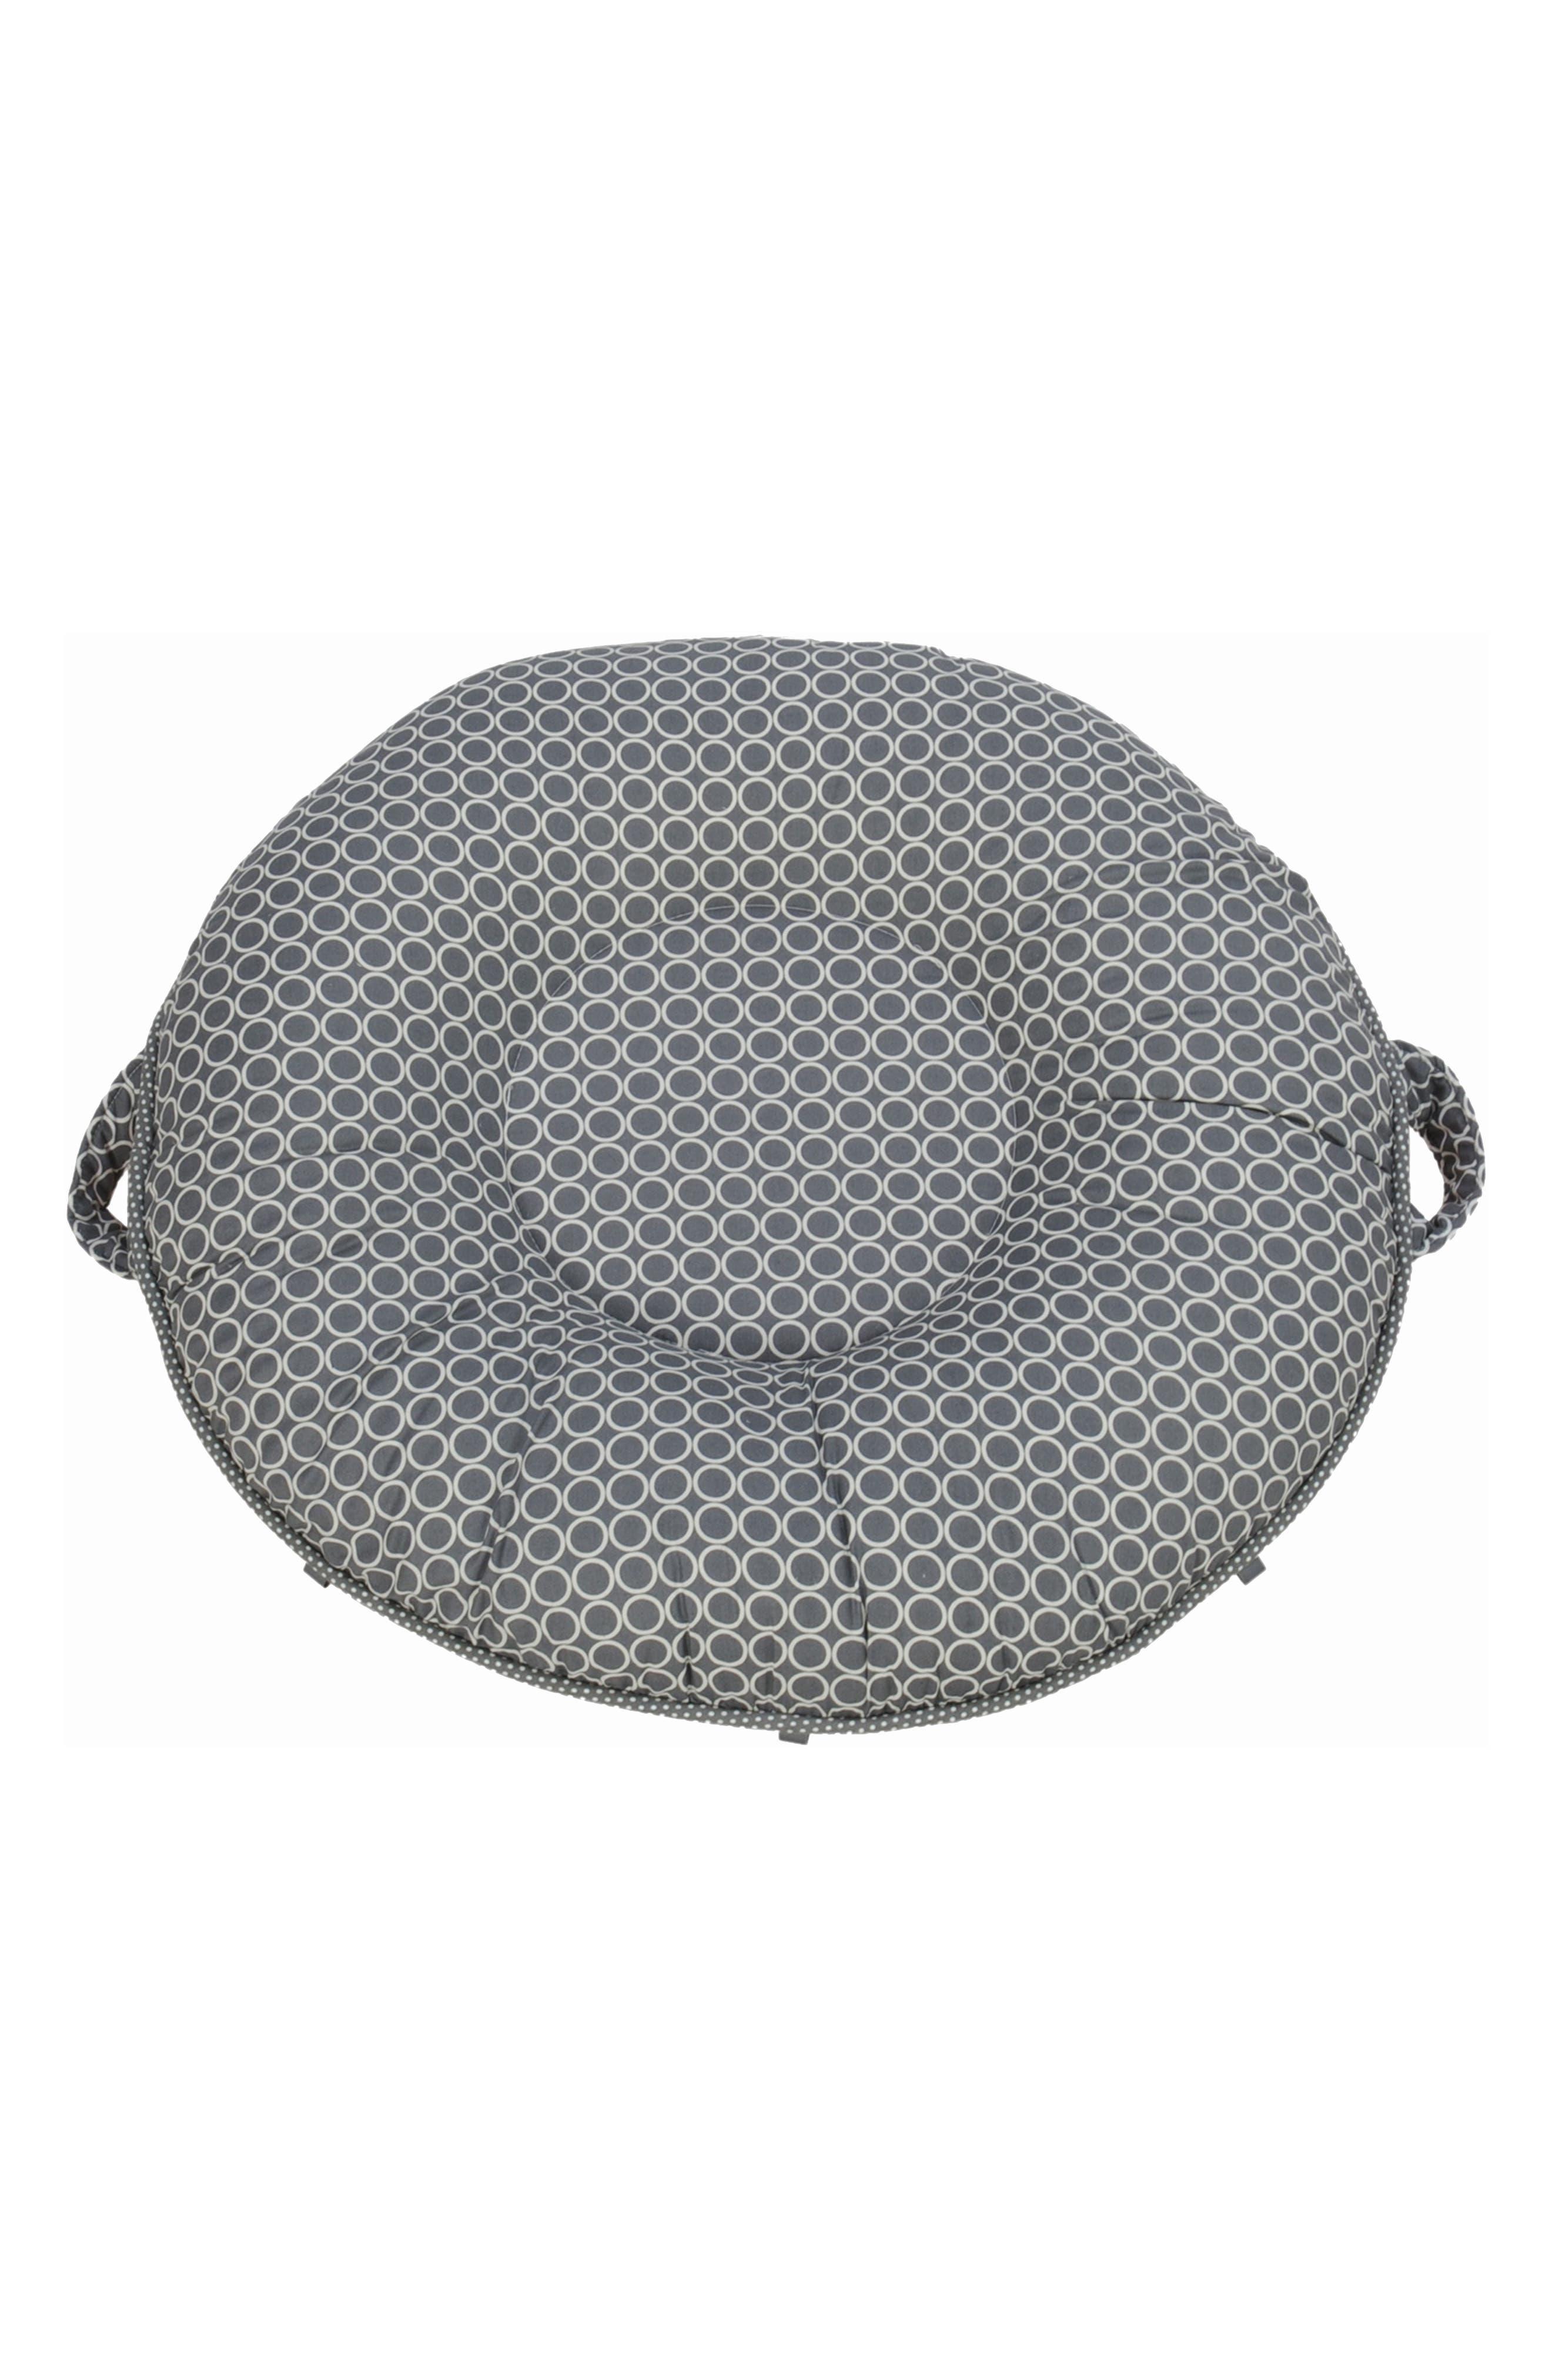 Pello Majestic Luxe Portable Floor Pillow (Baby)